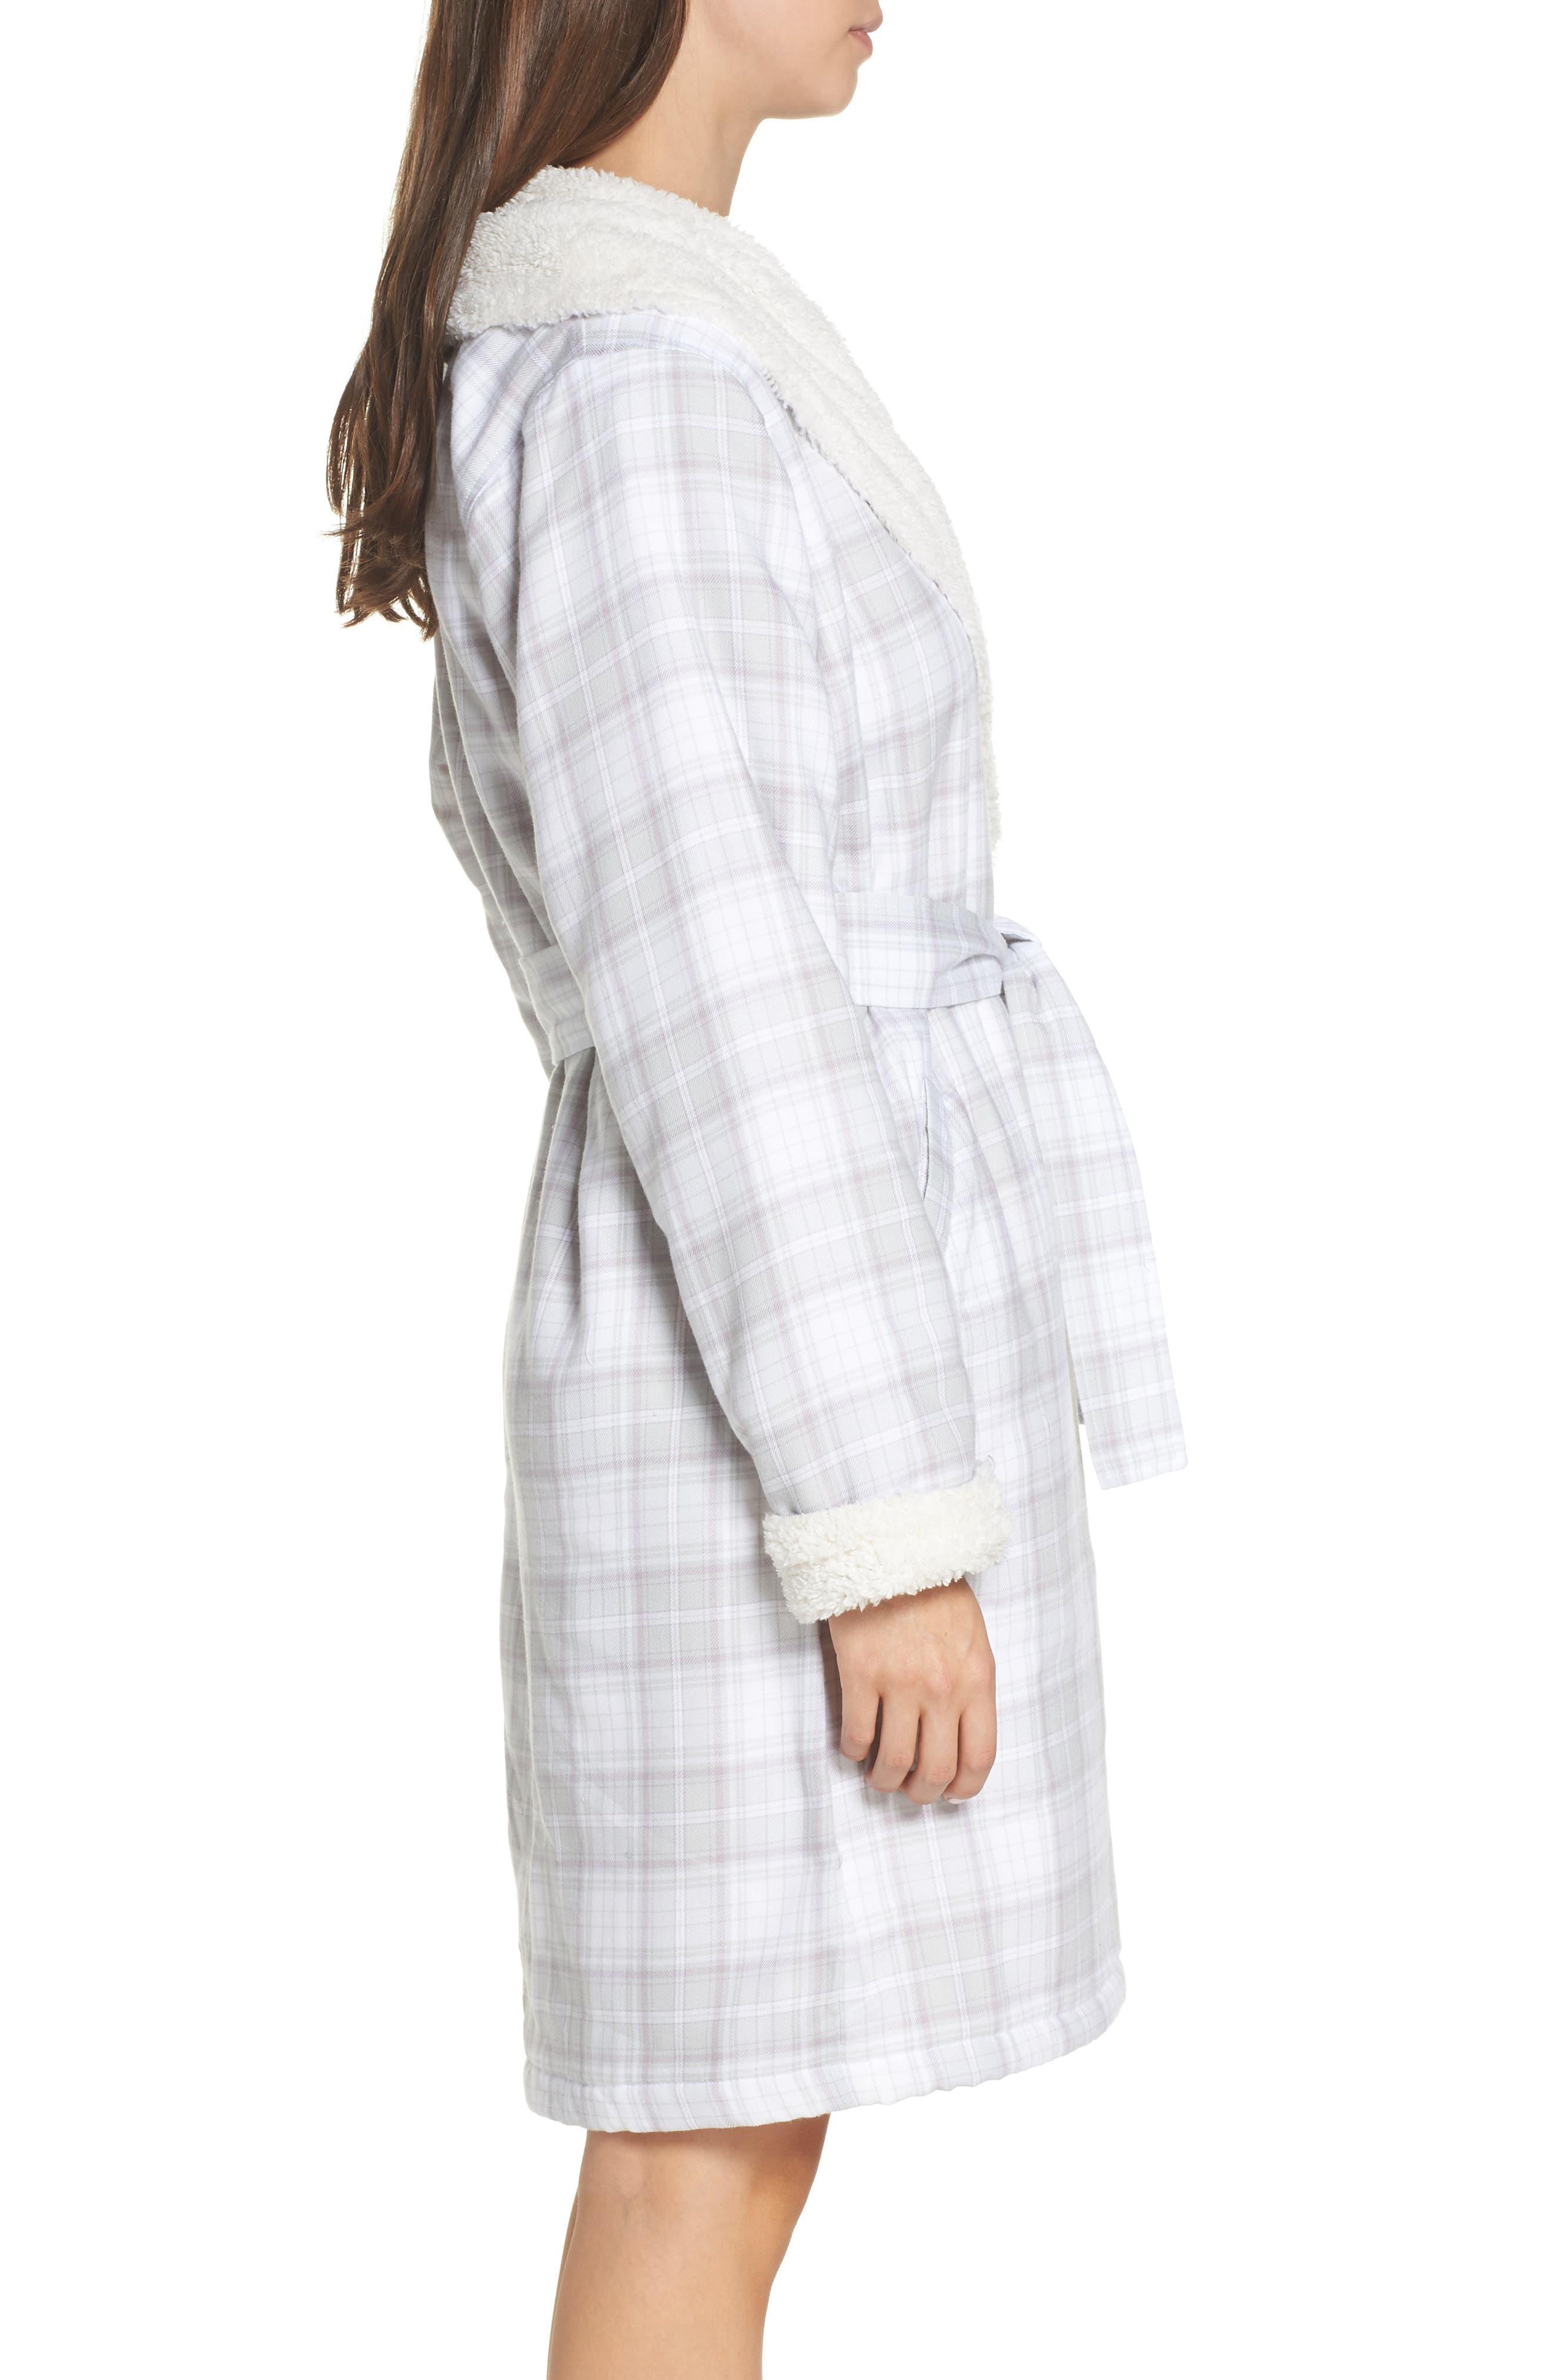 Anika Fleece Lined Flannel Robe,                             Alternate thumbnail 3, color,                             LAVENDER AURA PLAID